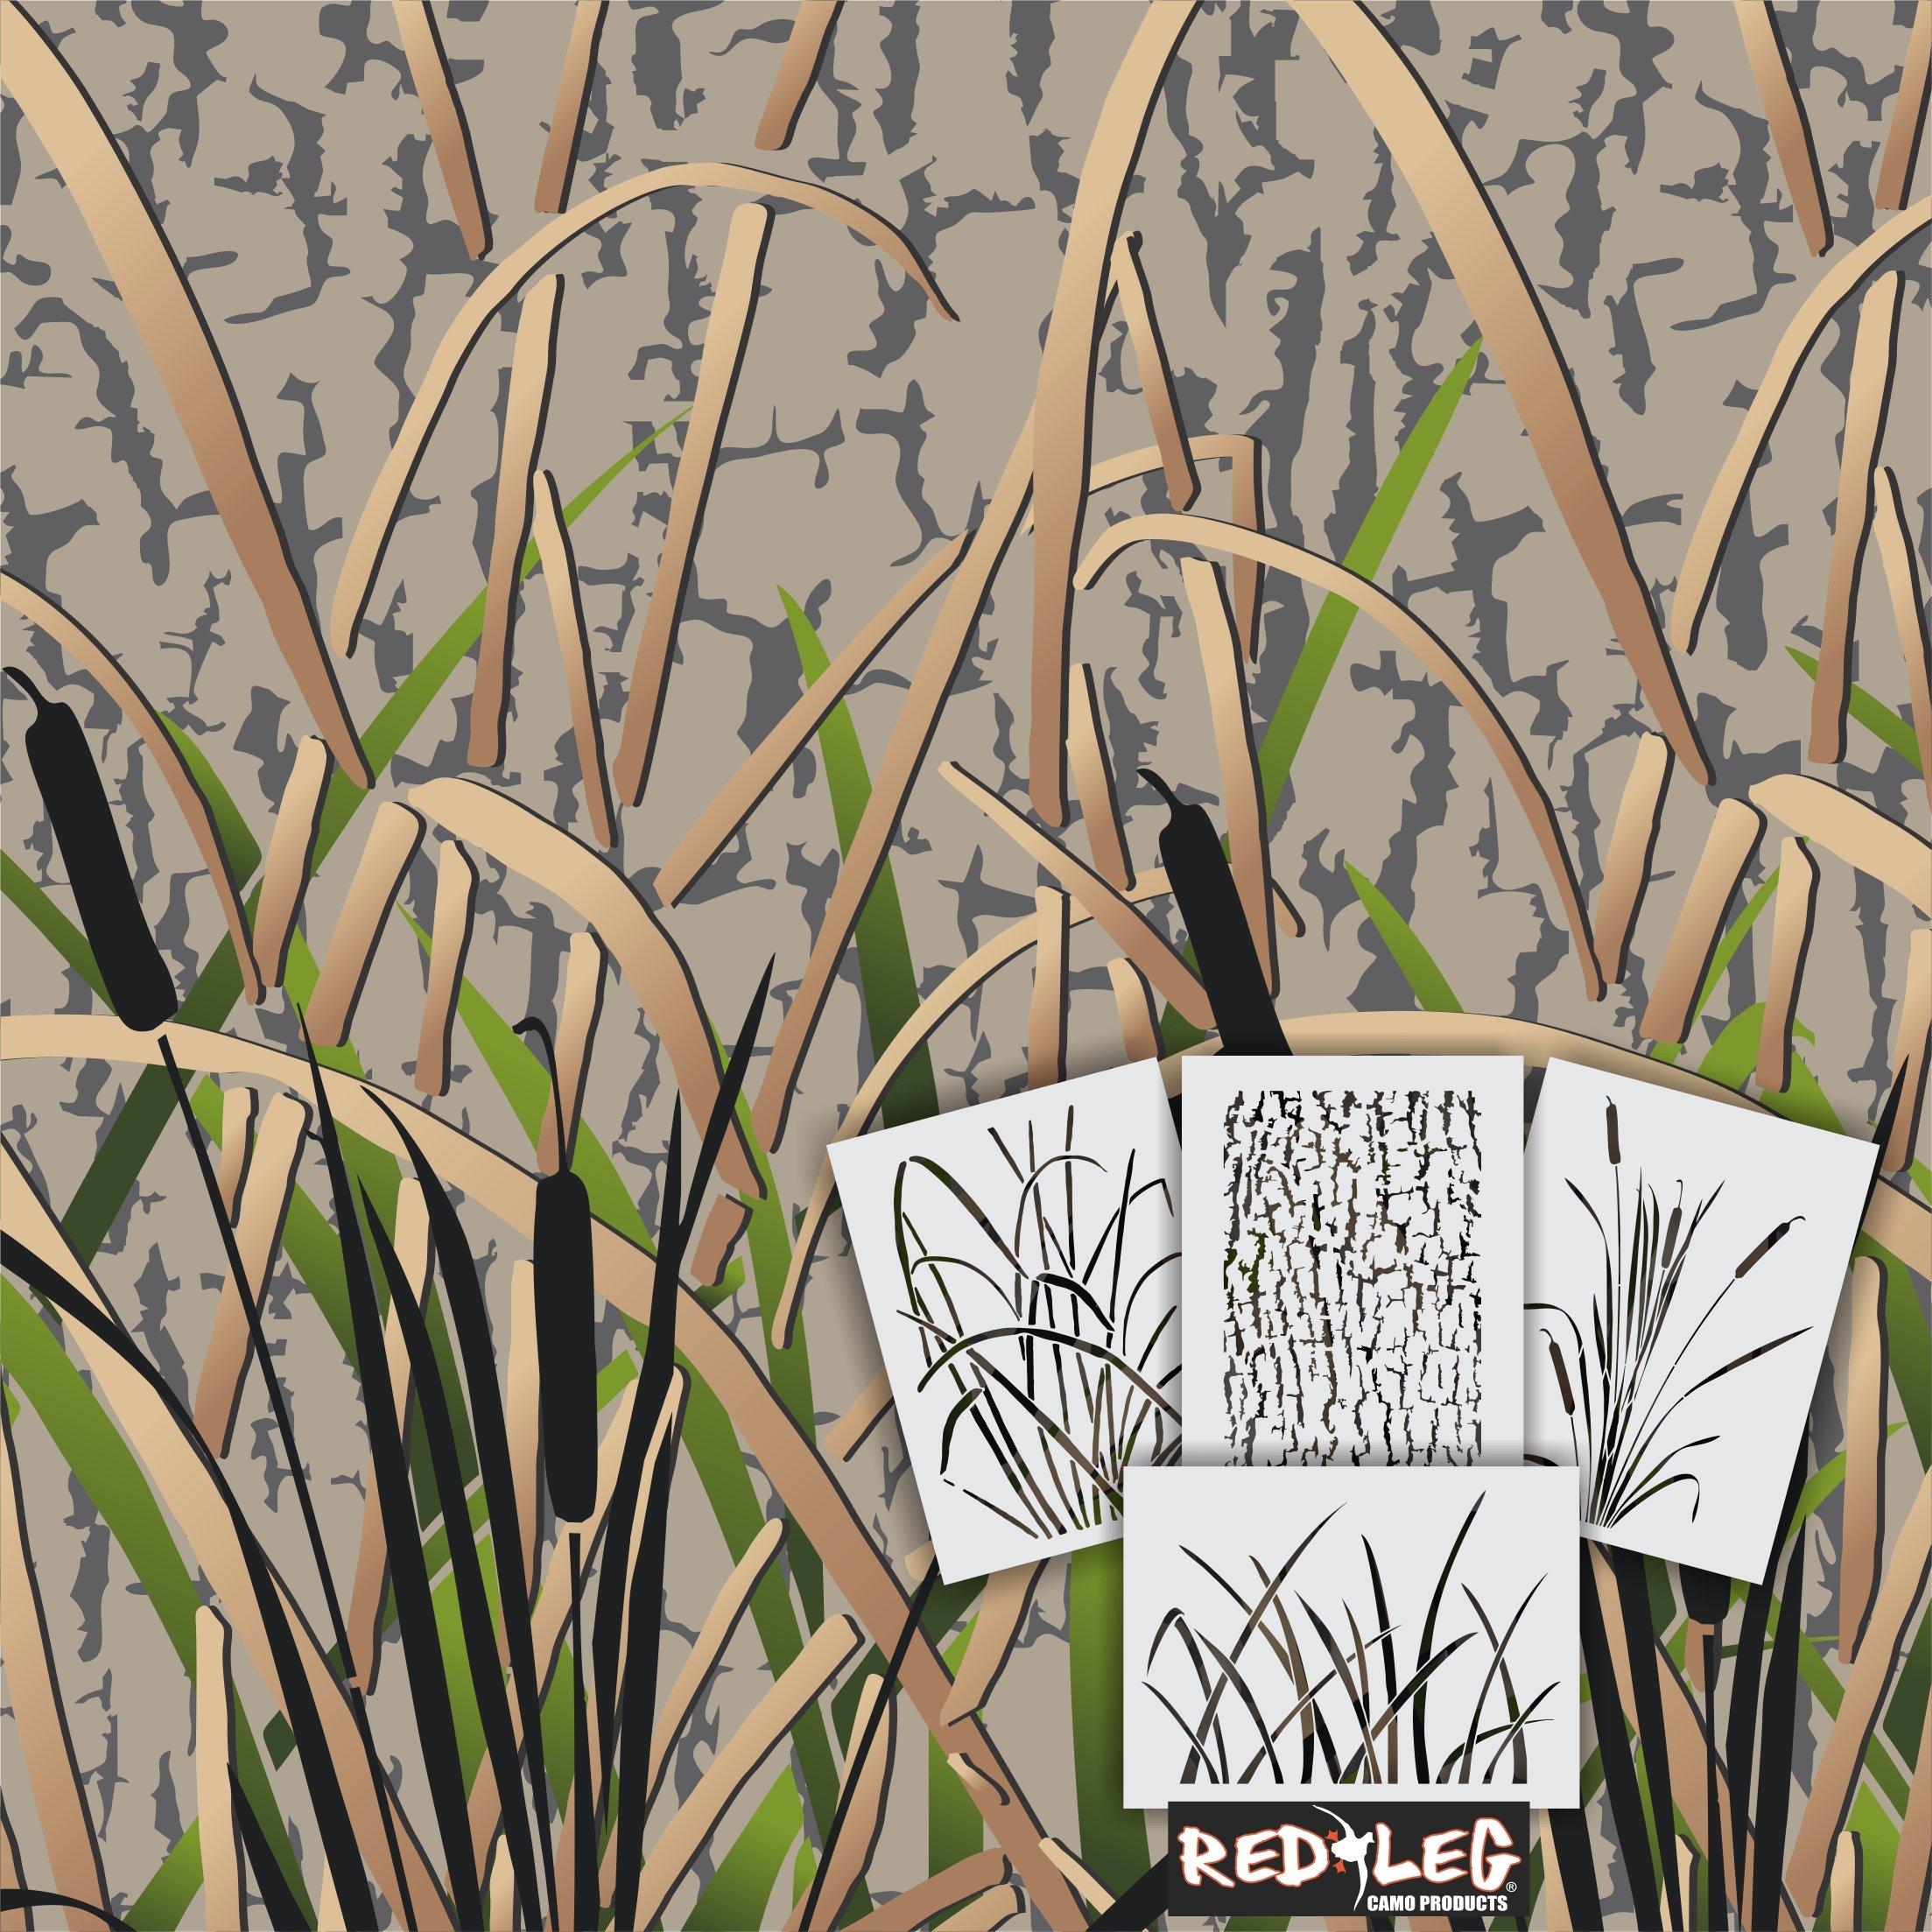 Redleg Camo GK4 4 Piece Grass Wetland Duck Camouflage Stencil kit 14'' X 11''